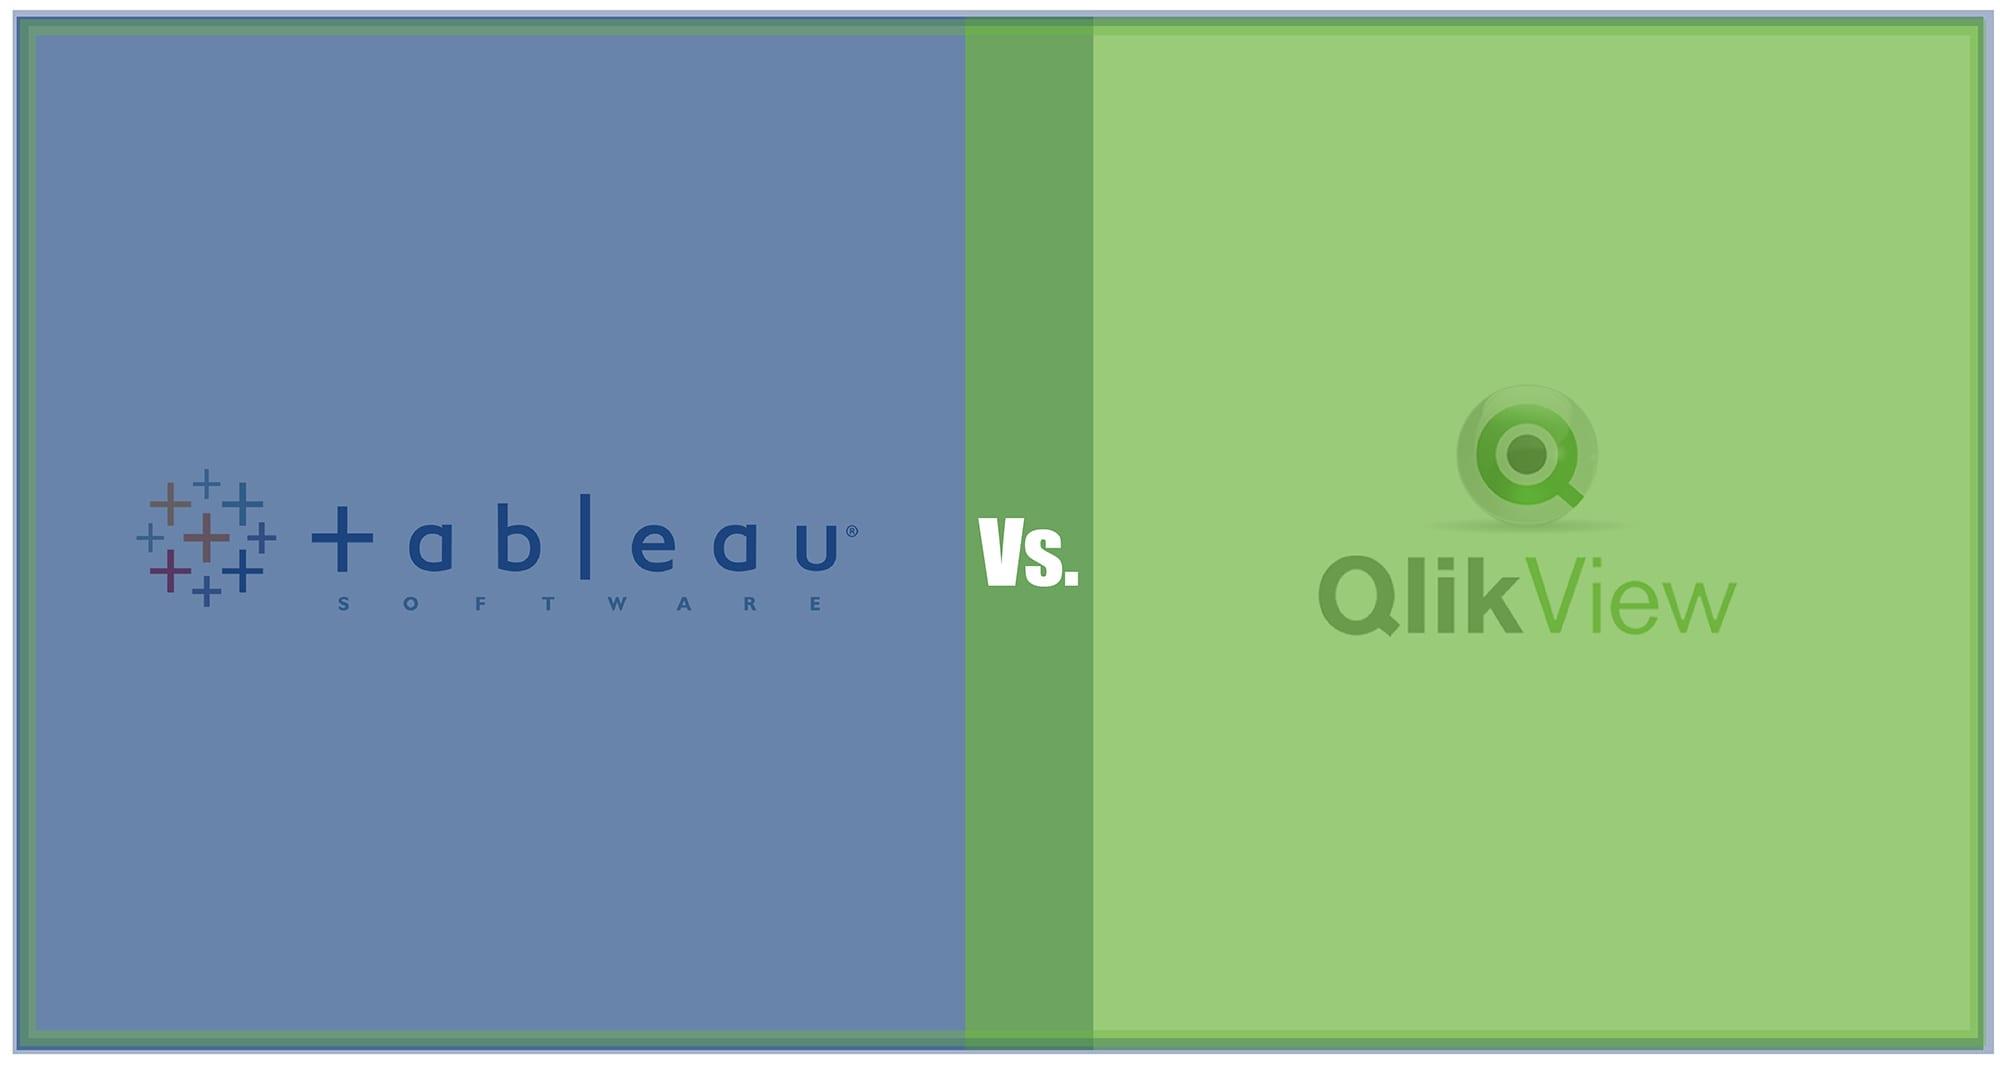 Tableau vs Qlik: Comparing Data Visualization tools Tableau and QlikView